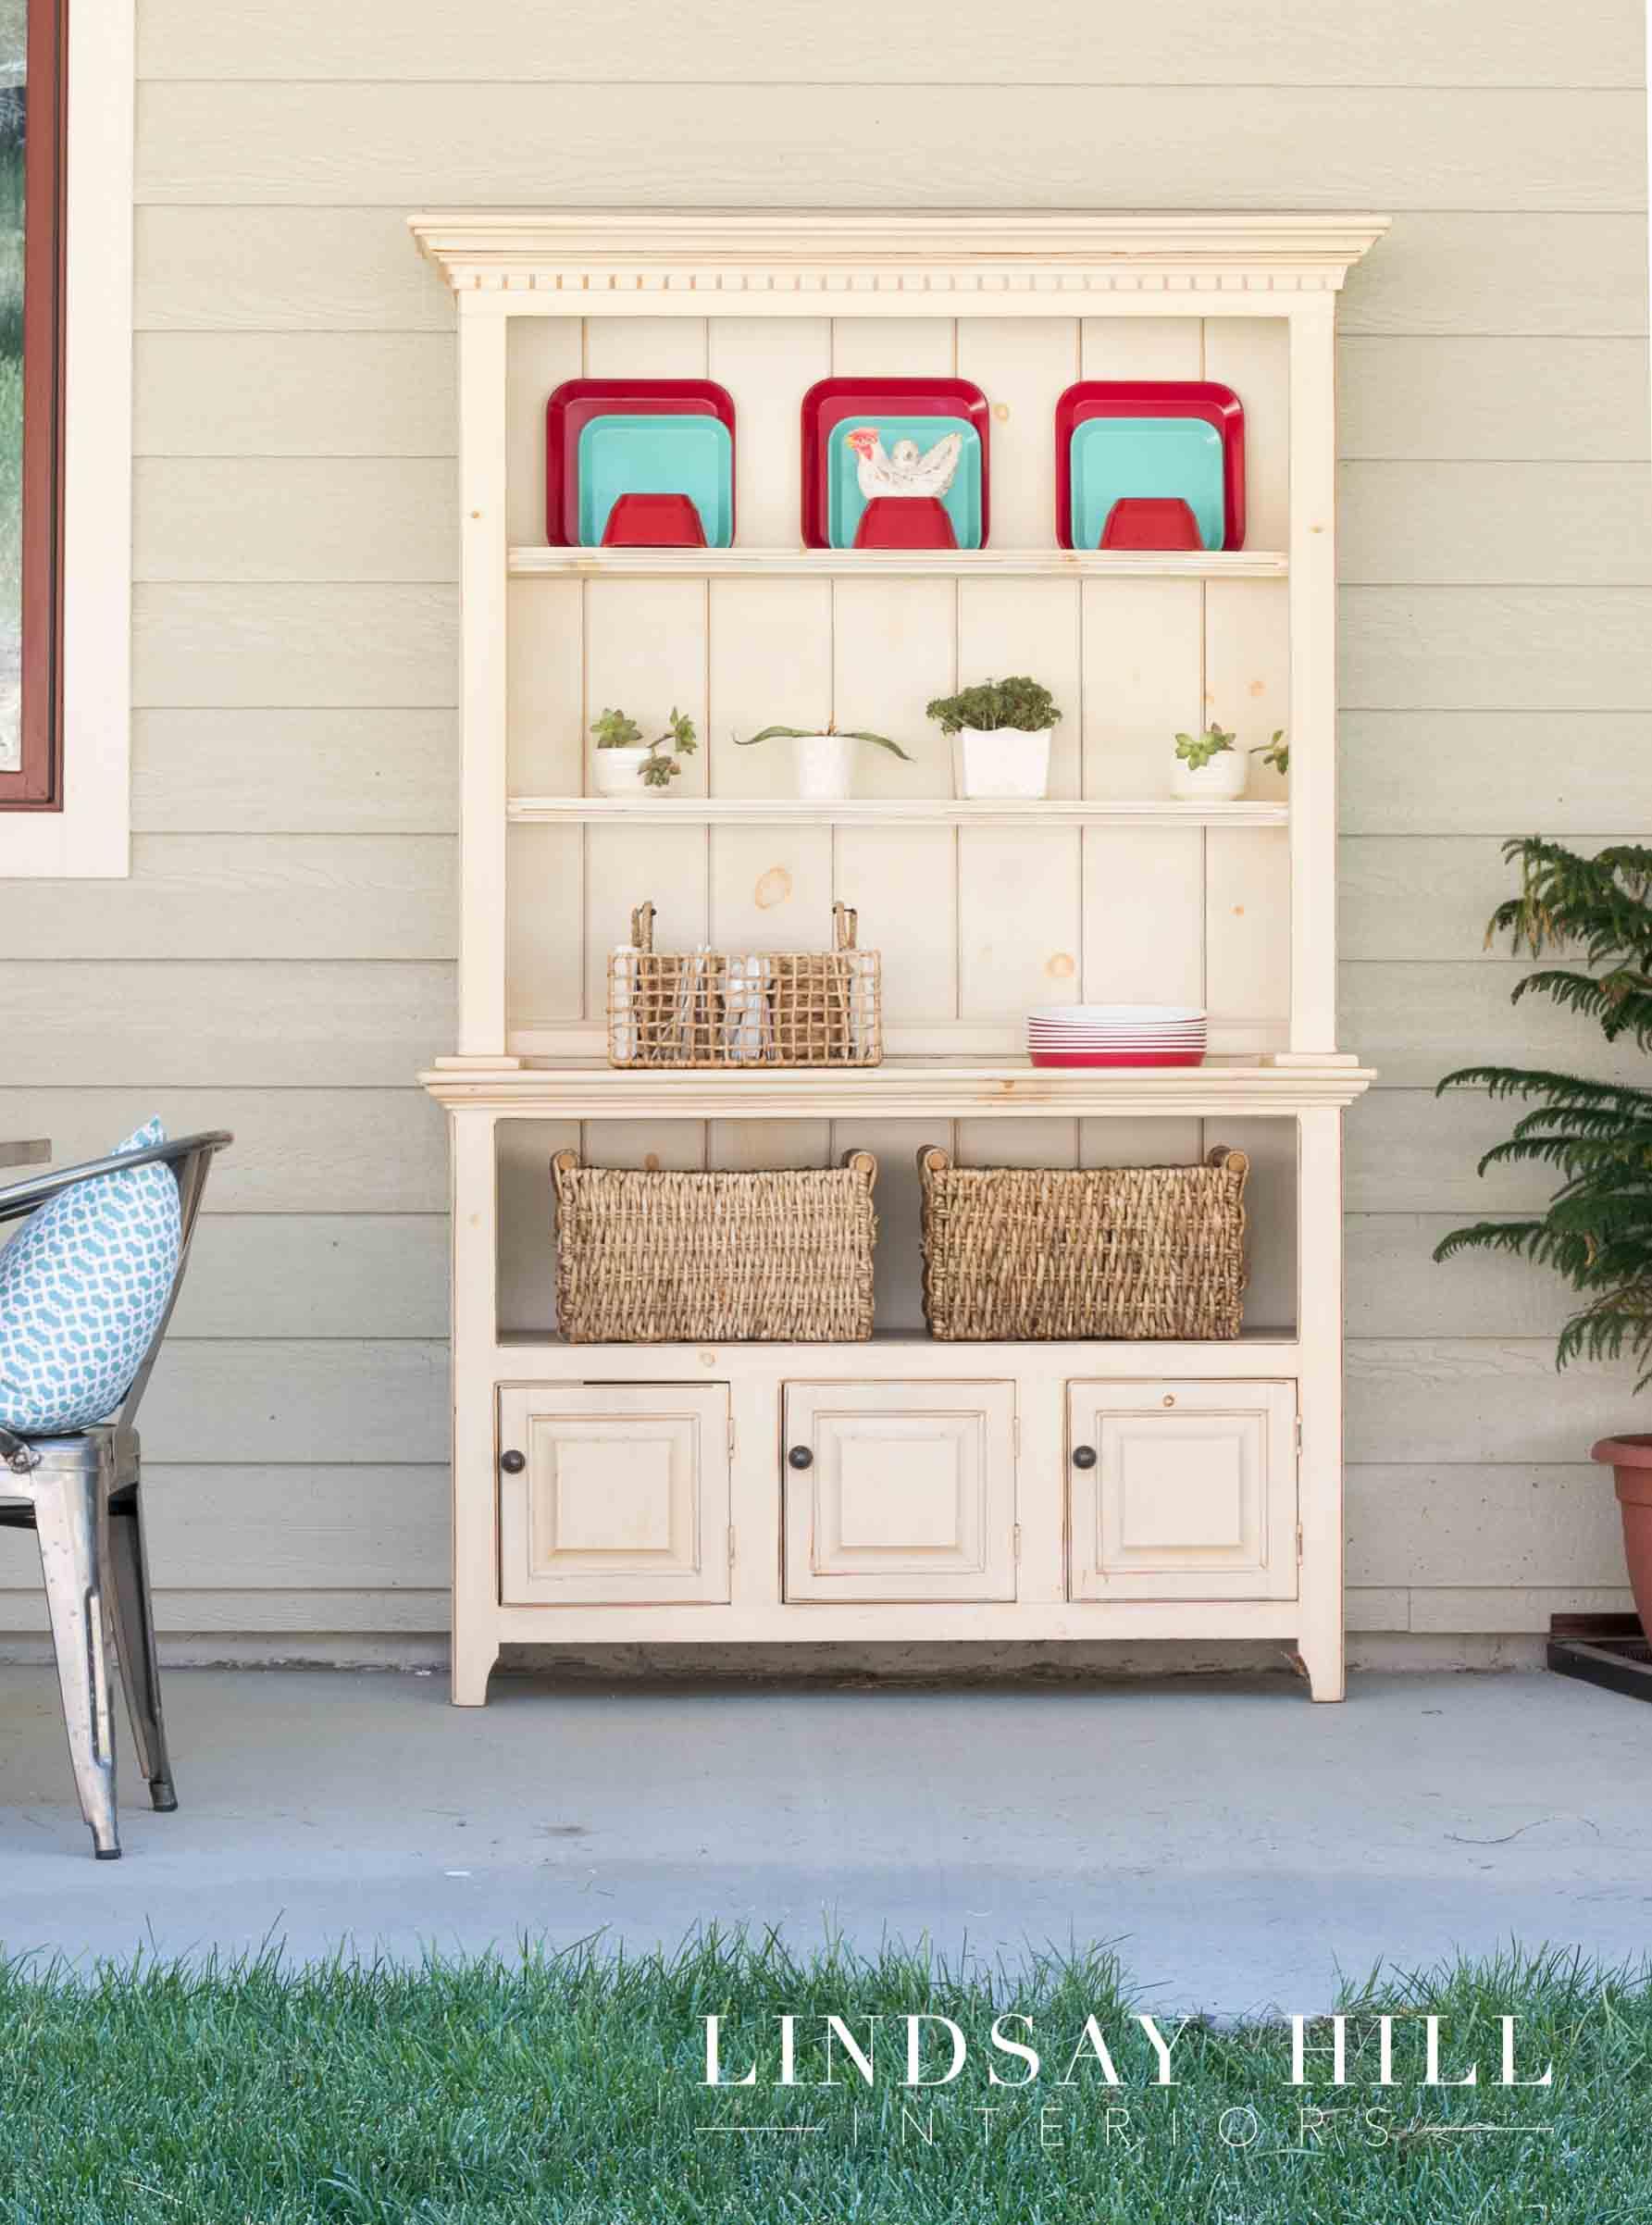 Superbe Store Backyard Entertaining Essentials In A Handy Spot